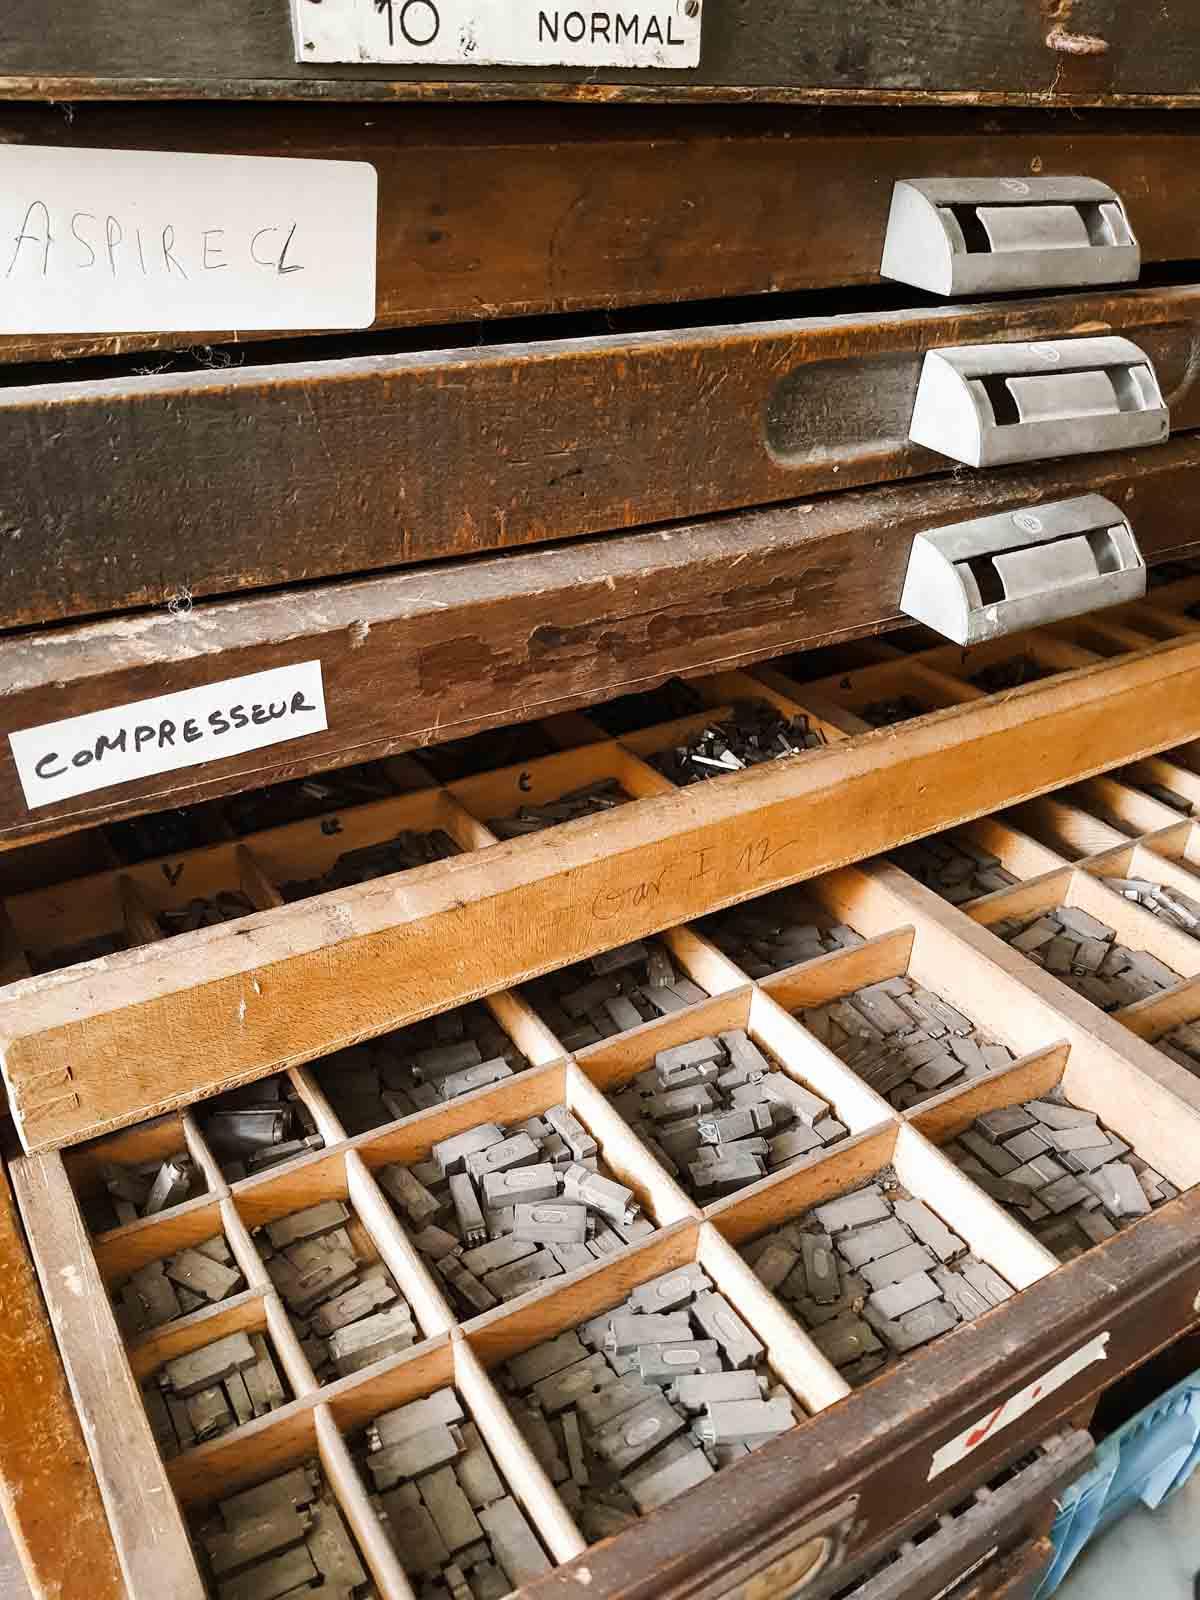 Centre de la Gravure stempel letters voor drukkunst